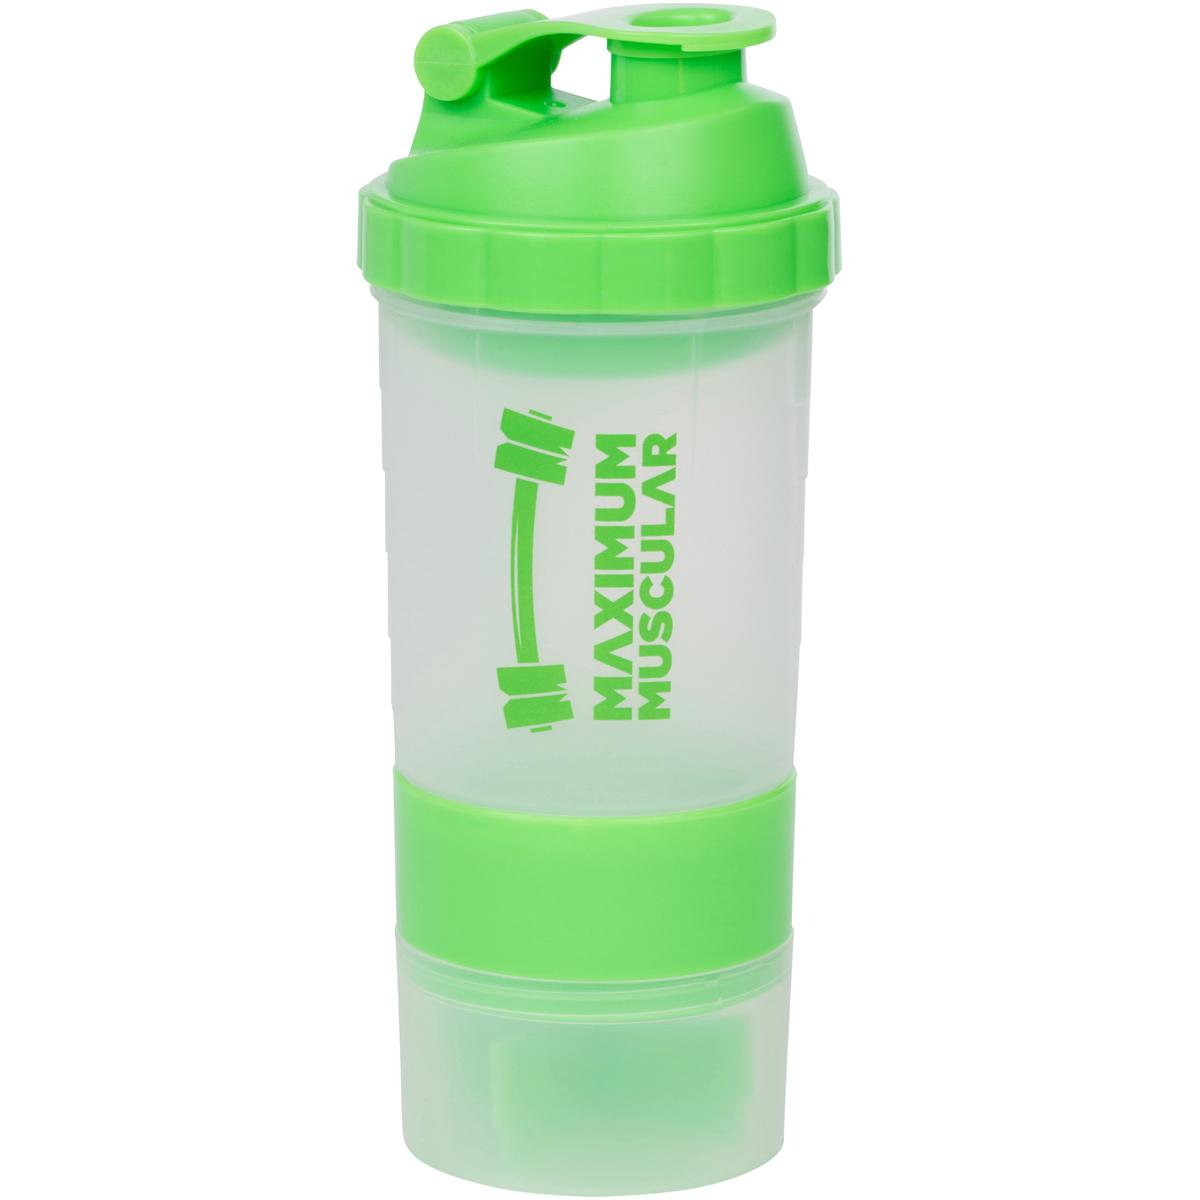 Protein Shaker Net: TiffsPixieDust: Protein Shaker Bottle Giveaway